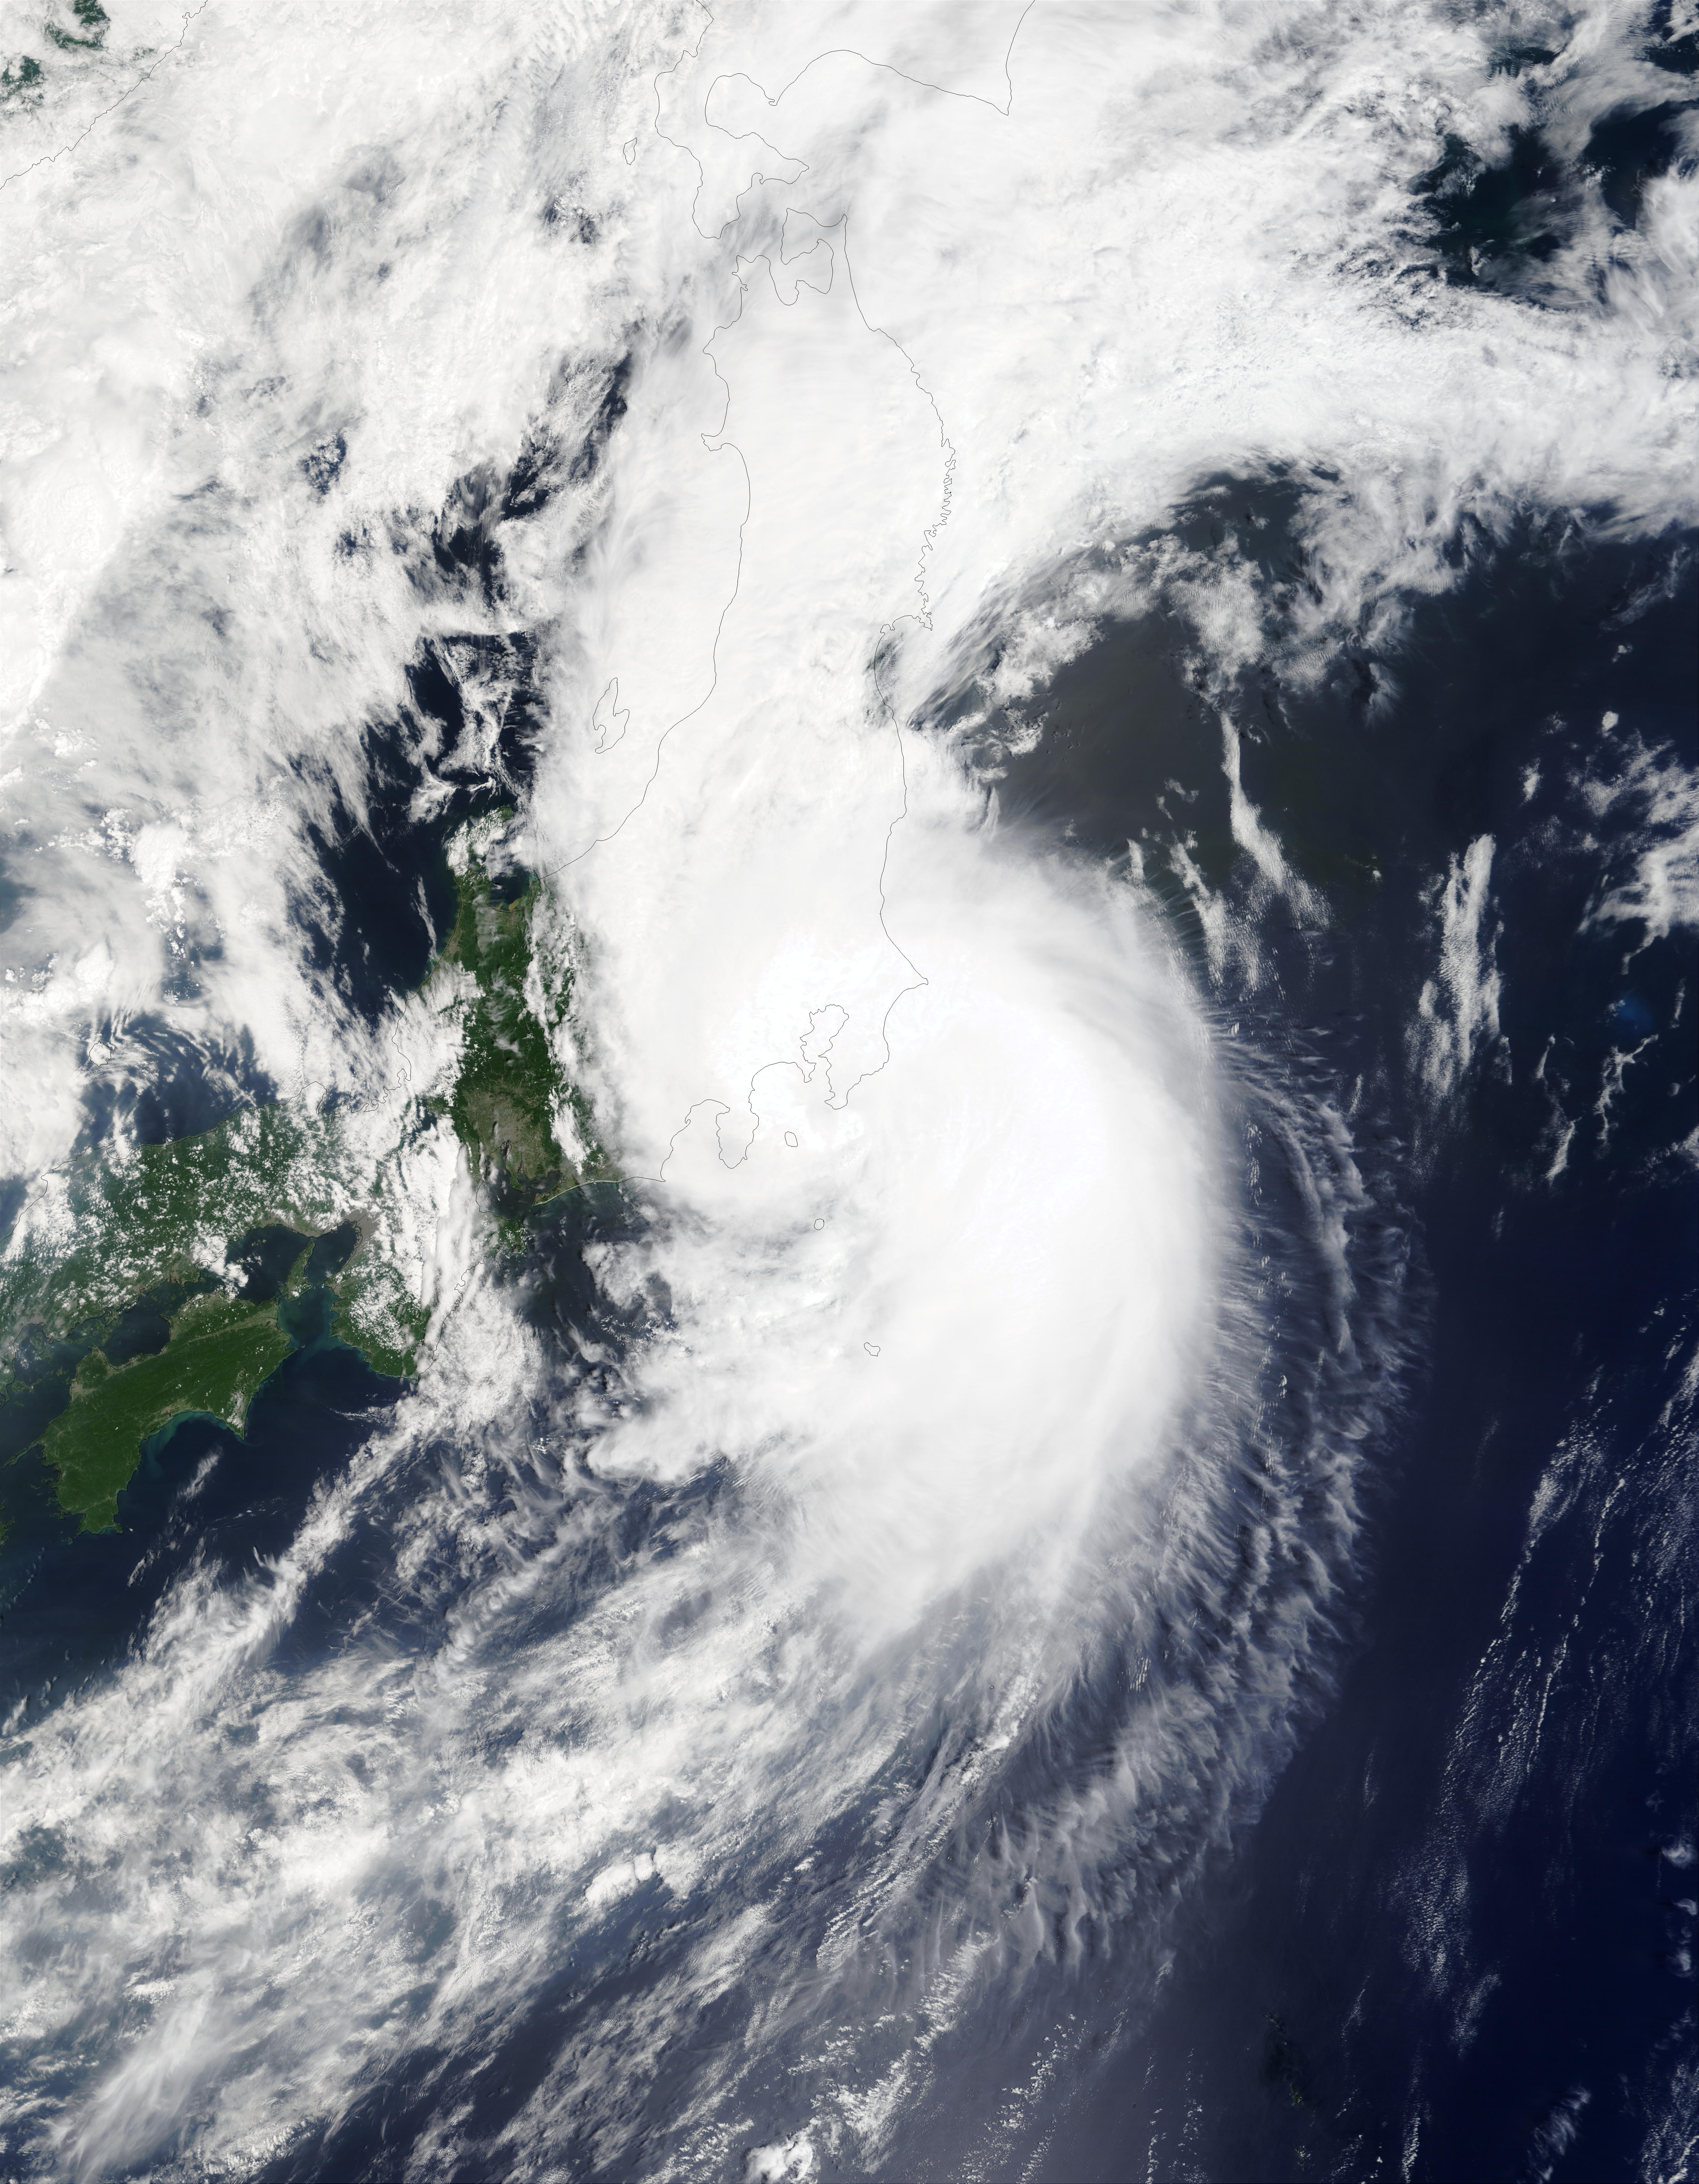 Typhoon Halong (10W) off Japan